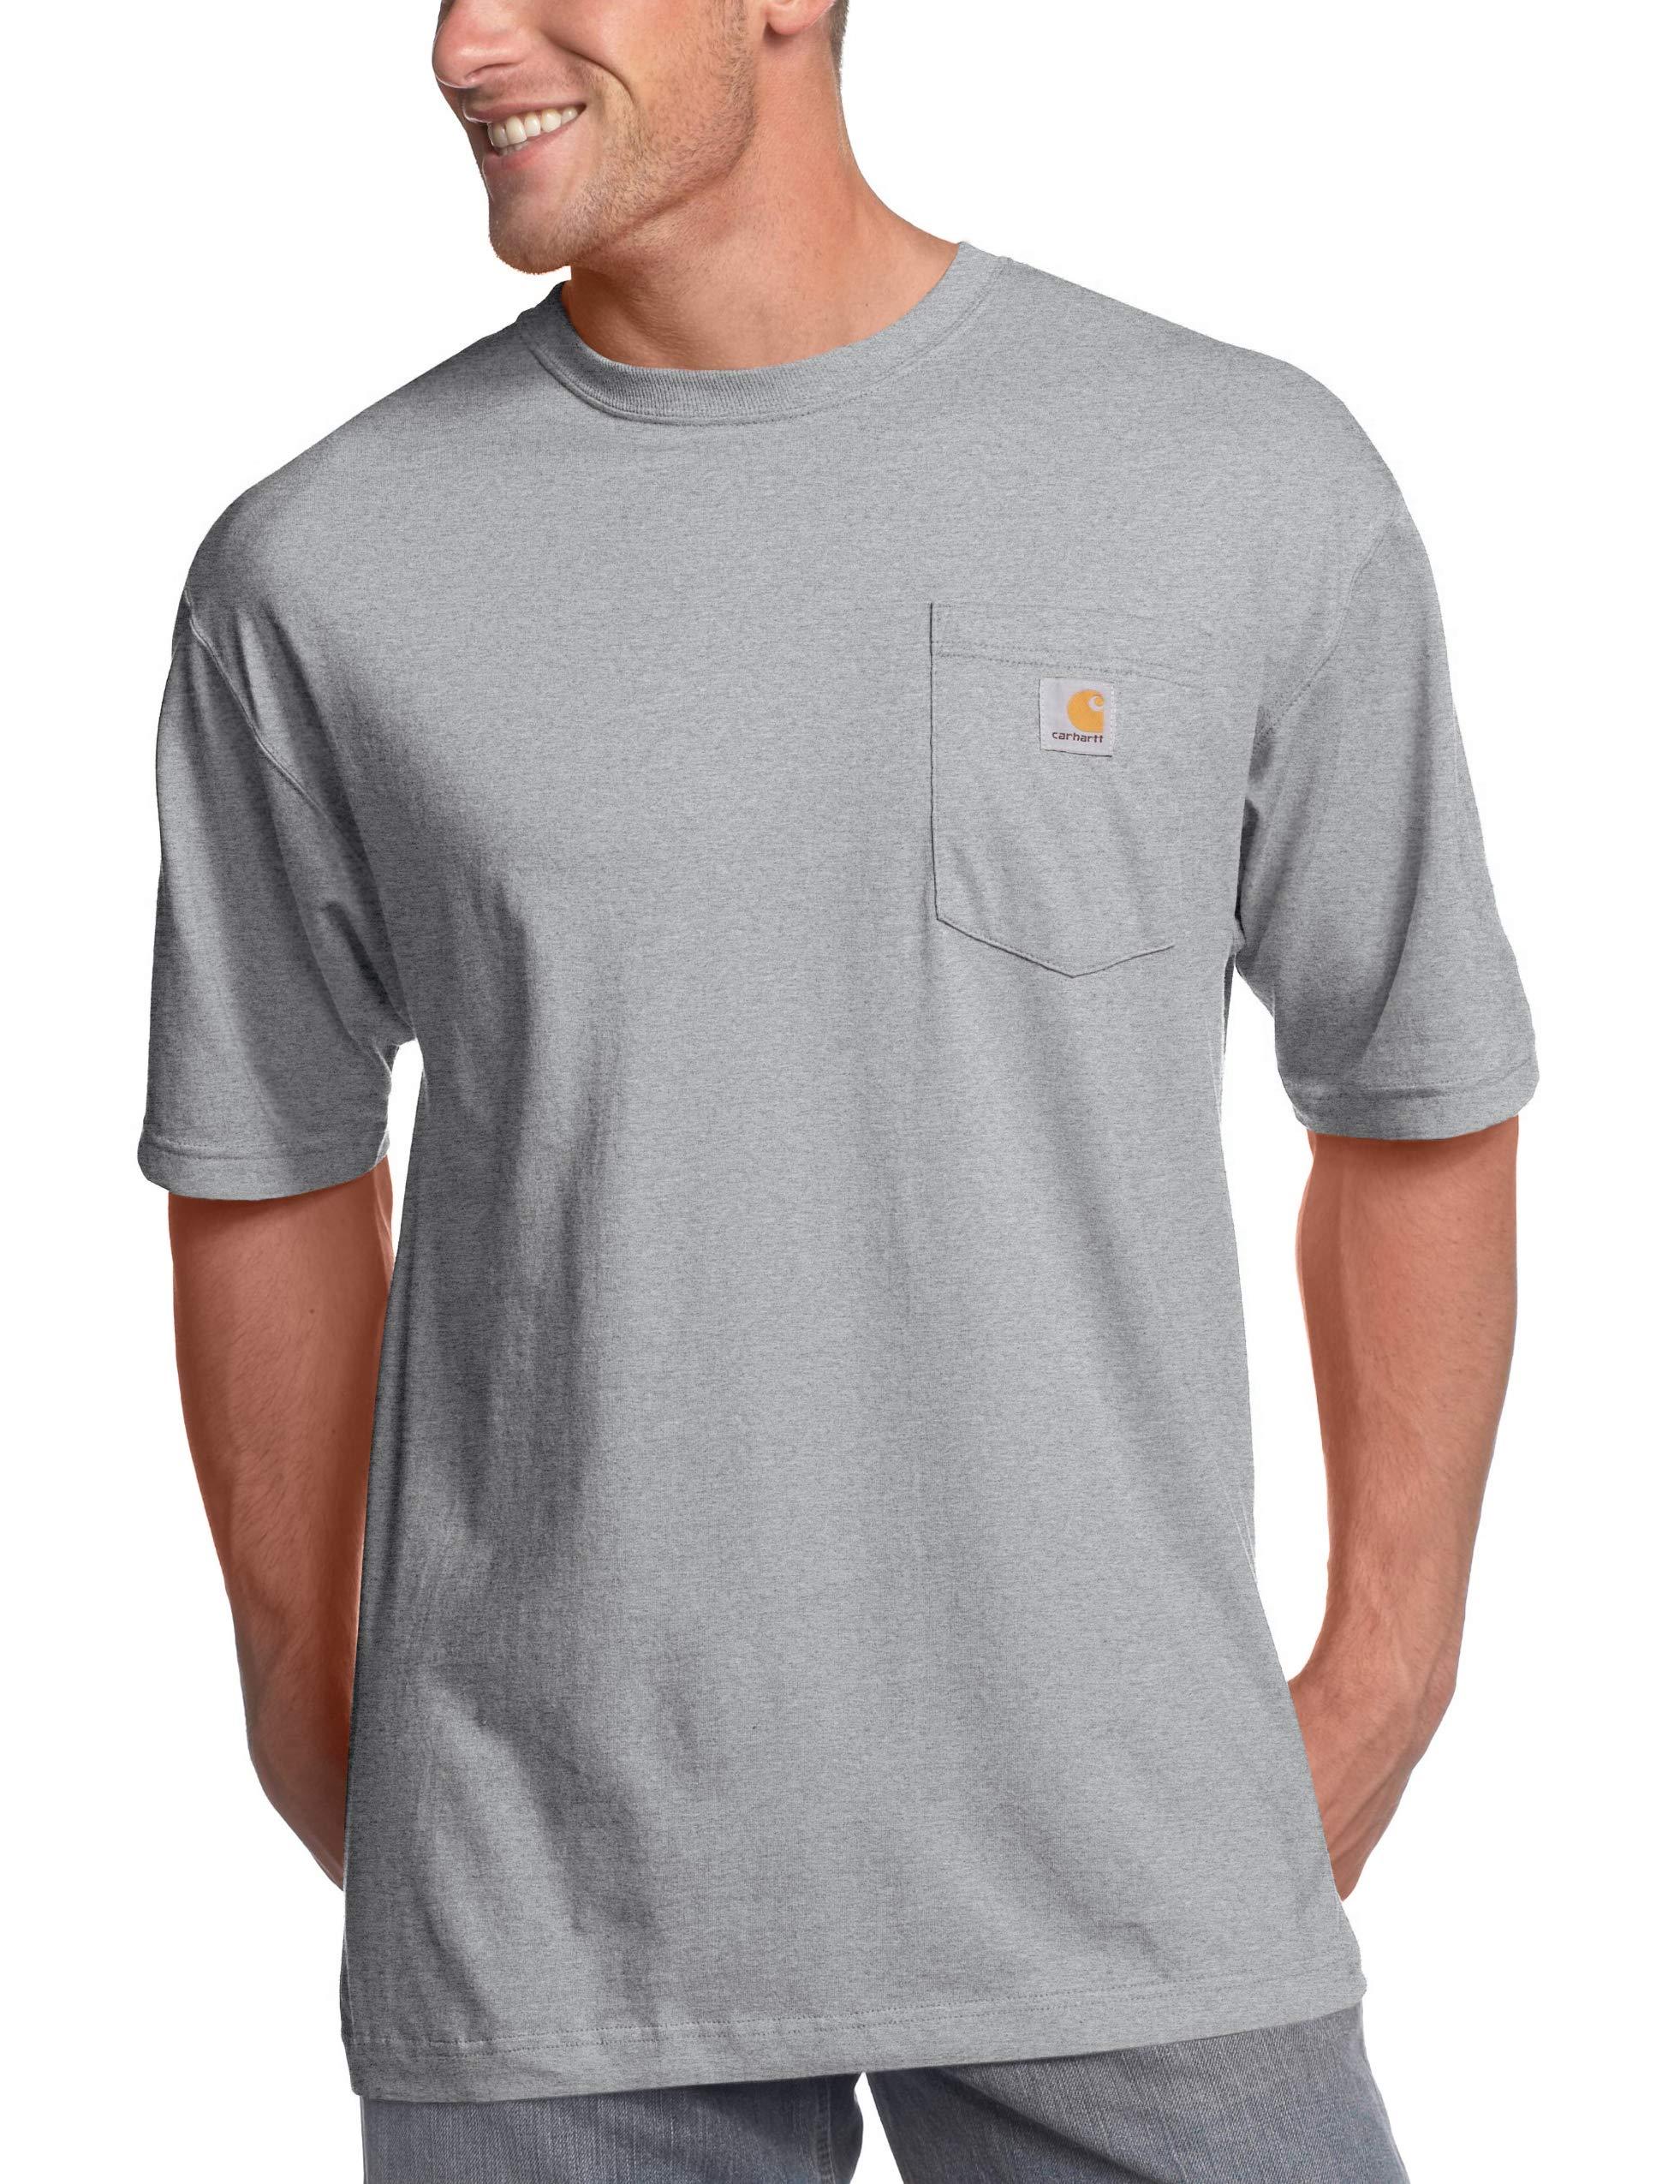 Carhartt Men's K87 Workwear Short Sleeve T Shirt (Regular and Big & Tall Sizes), Heather Grey, 4X Large